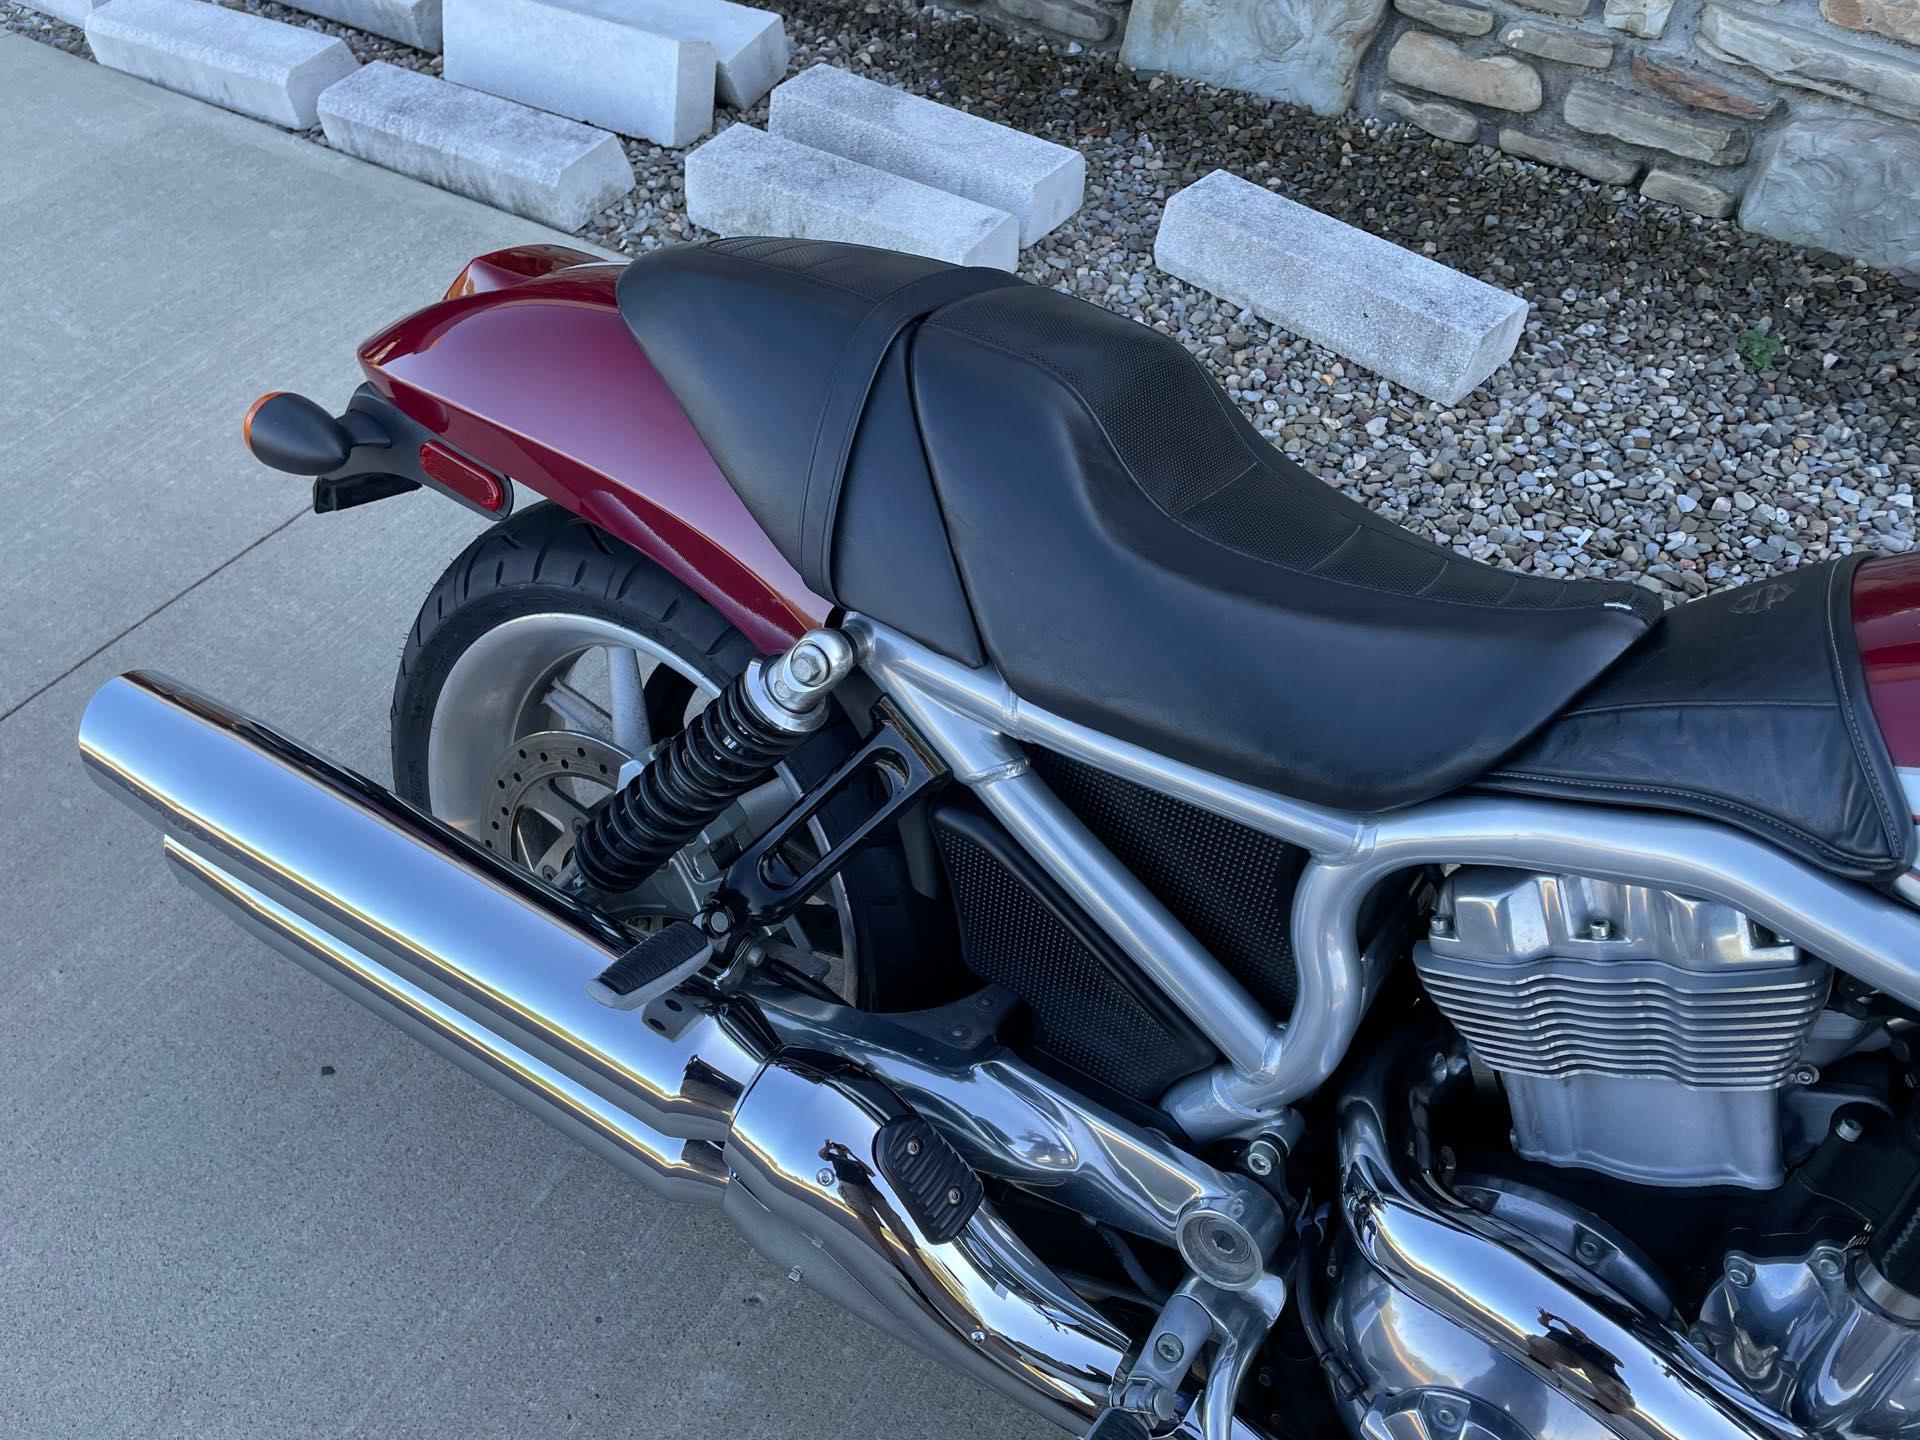 2006 Harley-Davidson VRSC Street Rod at Arkport Cycles